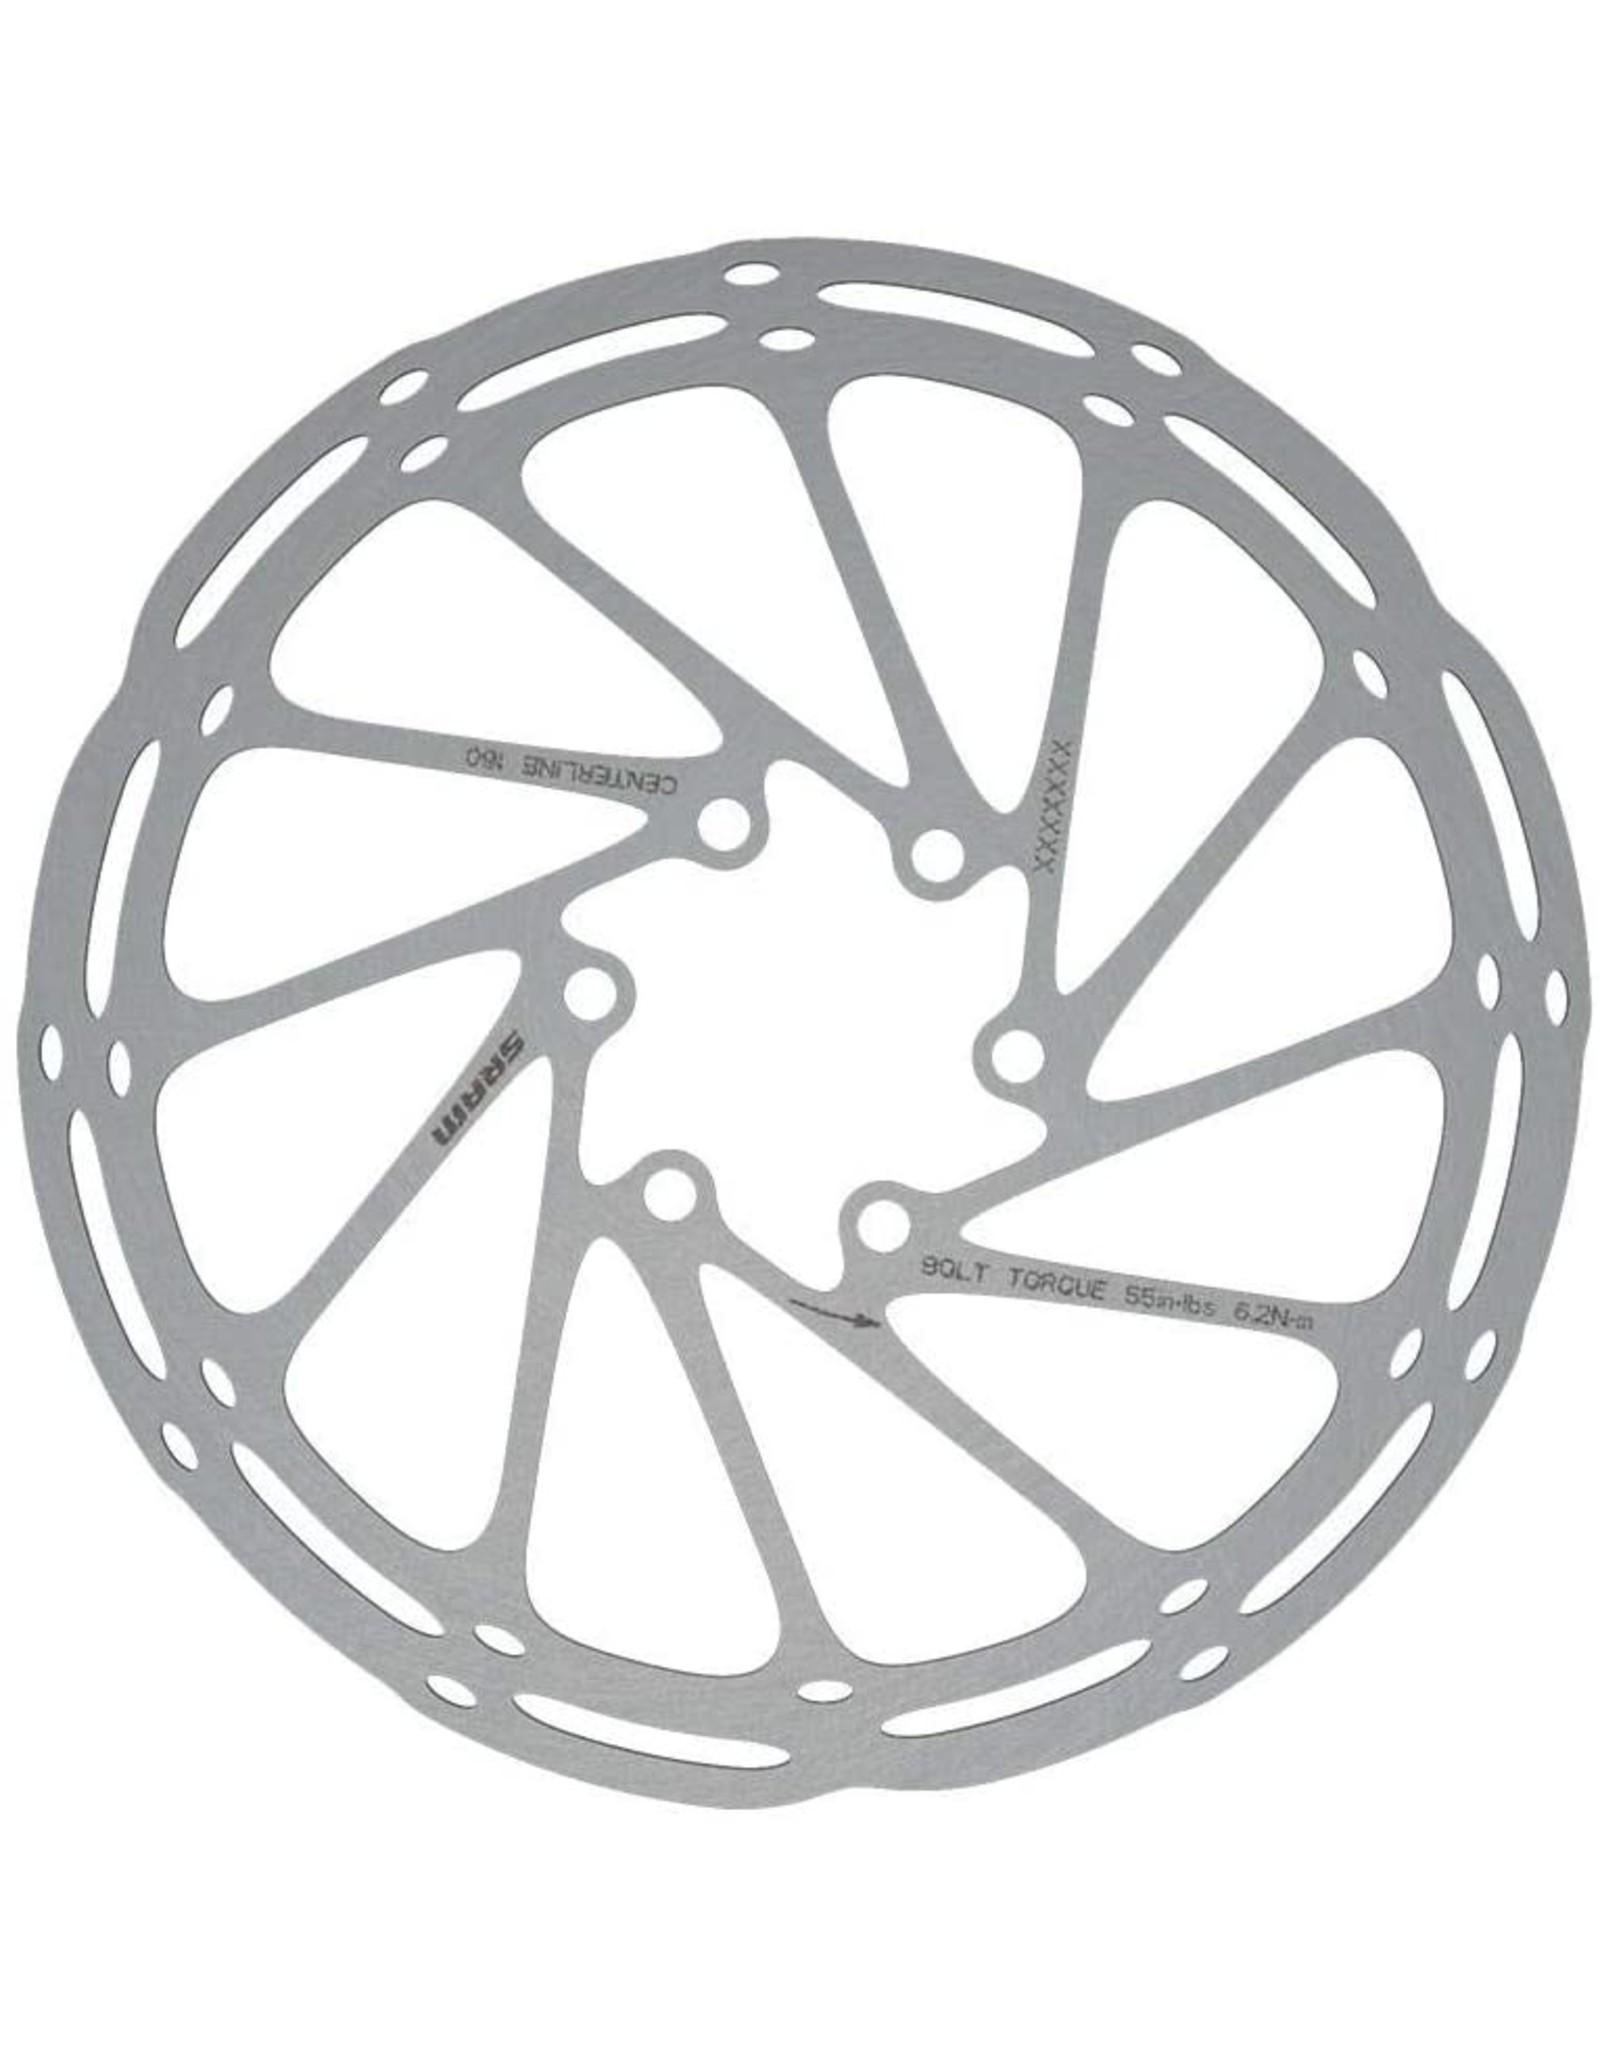 SRAM SRAM CenterLine Disc Brake Rotor - 180mm, 6-Bolt, Silver